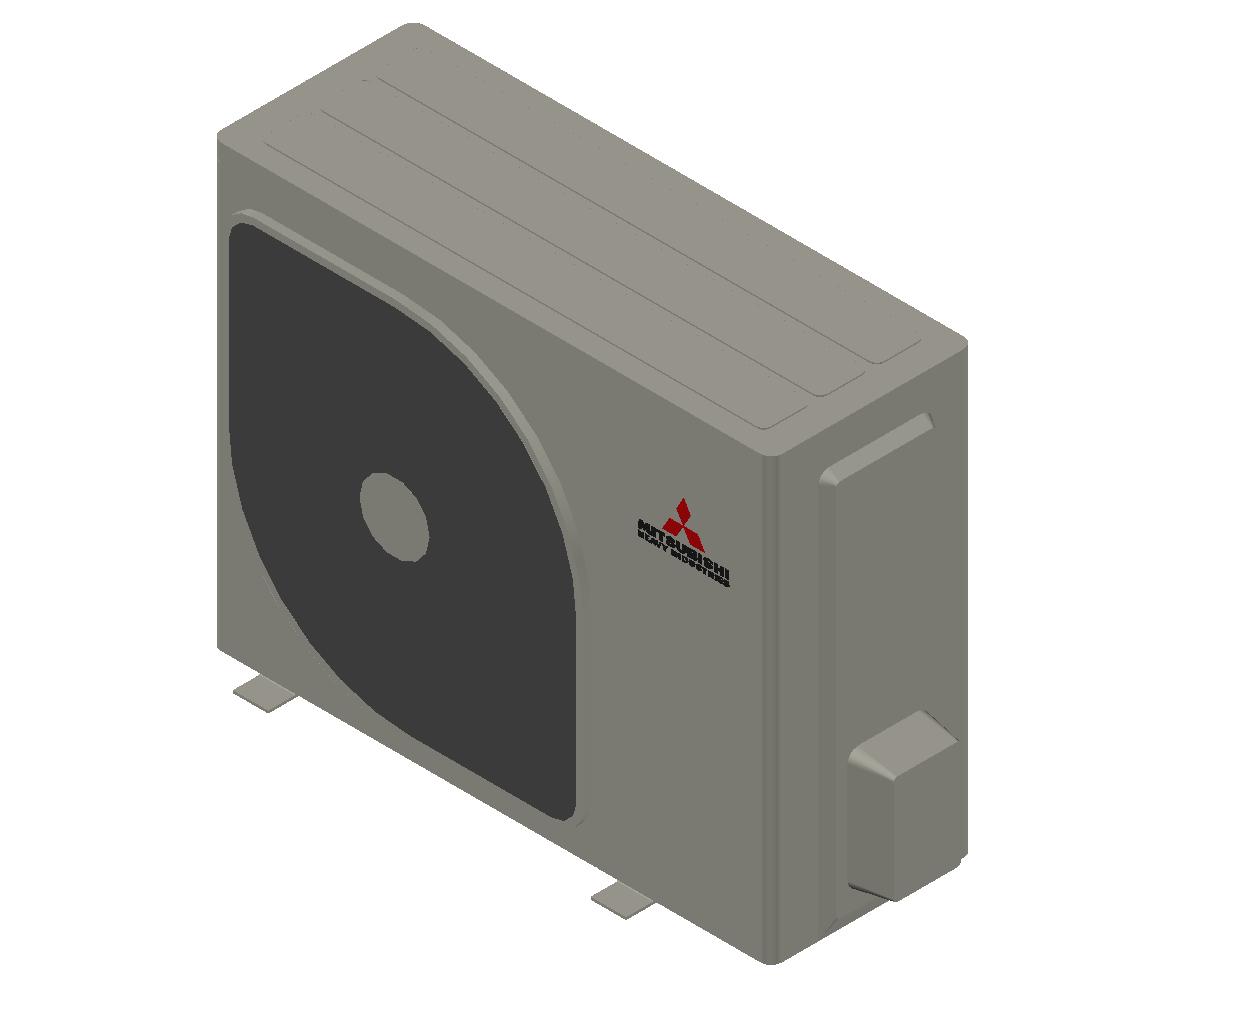 HC_Heat Pump_MEPcontent_Mitsubishi Heavy Industries_PAC-RAC_SRC50ZSX-W2_INT-EN.dwg